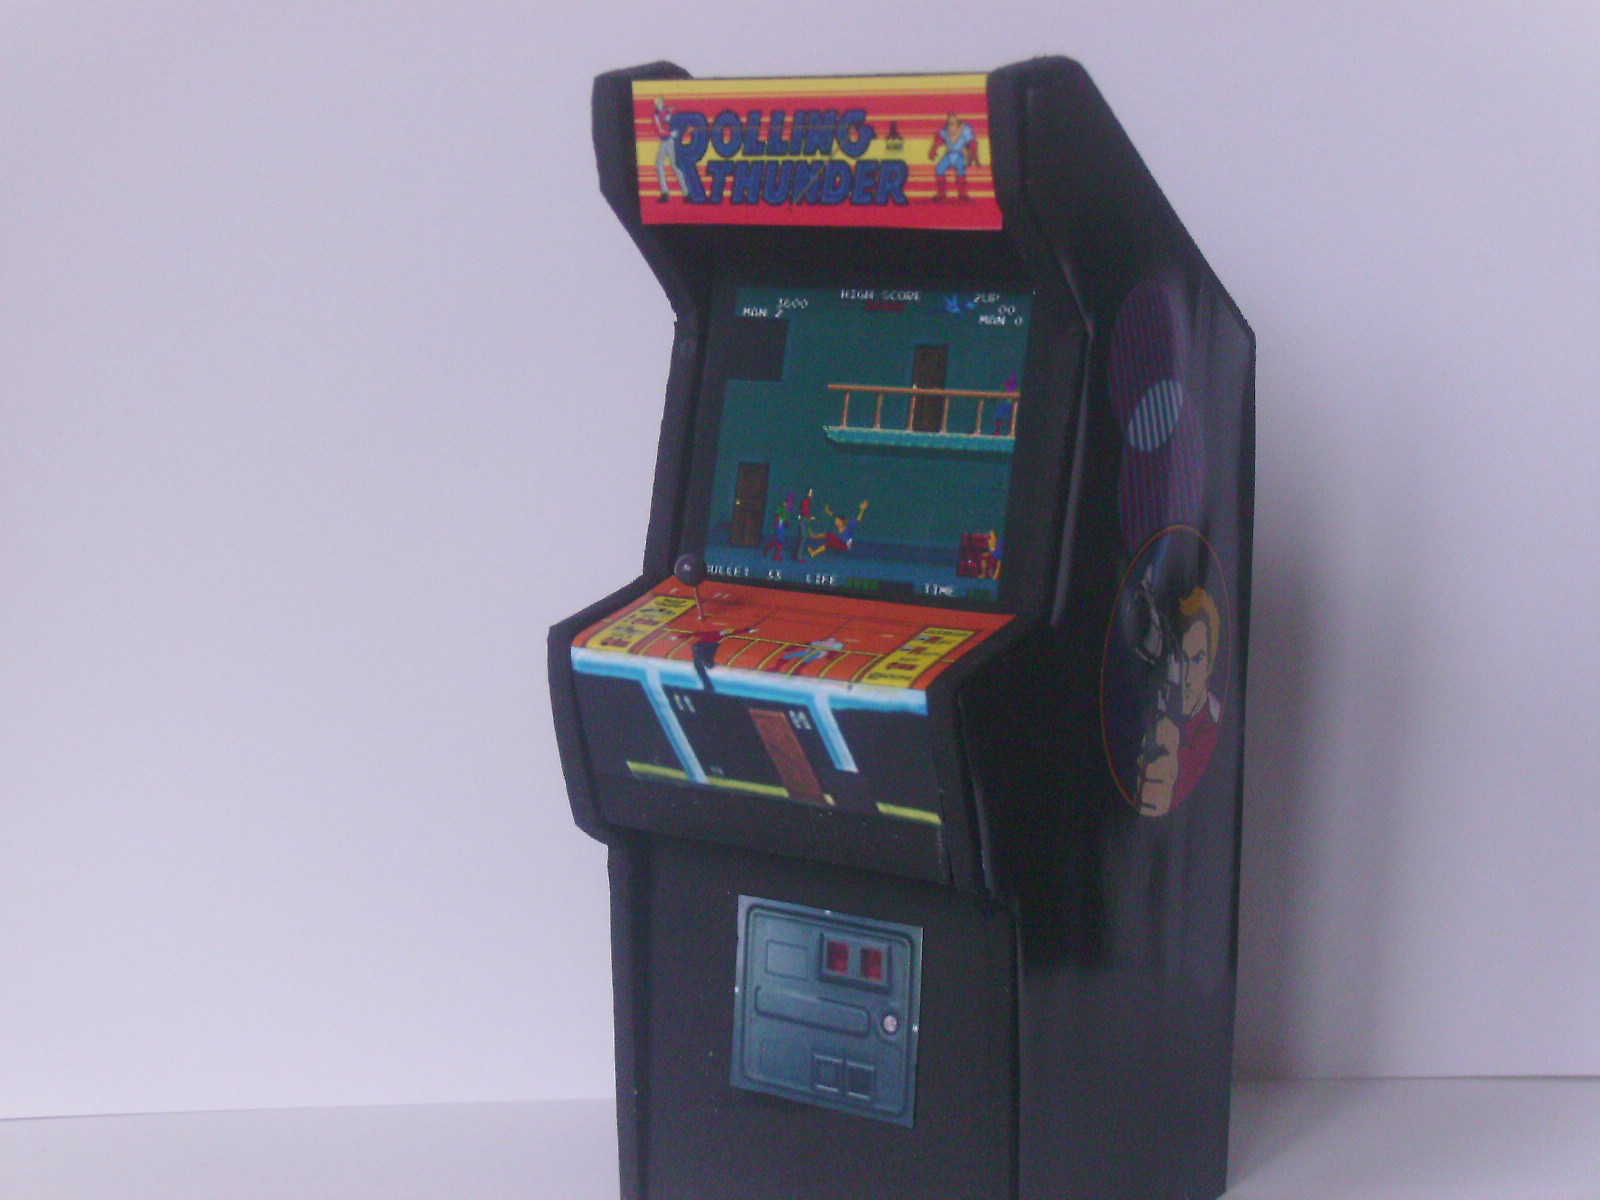 rolling thunder arcade machine